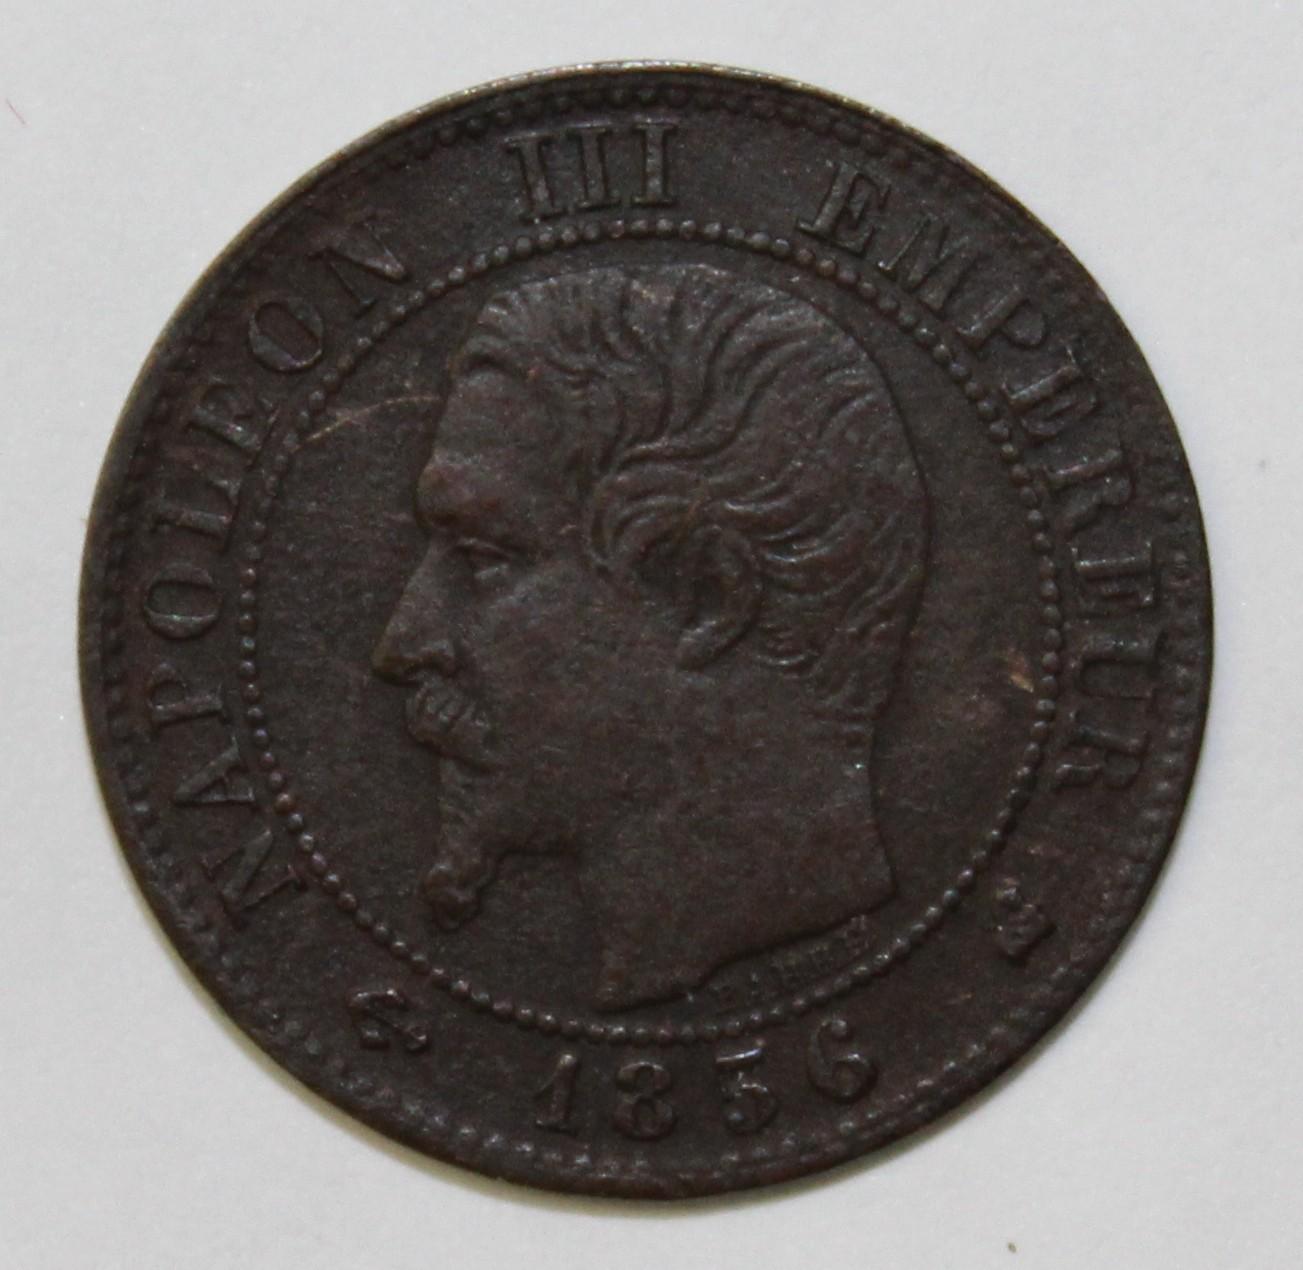 FRANCE - KM 775 1 - 1 CENTIME 1856 K BORDEAUX TYPE NAPOLEON III